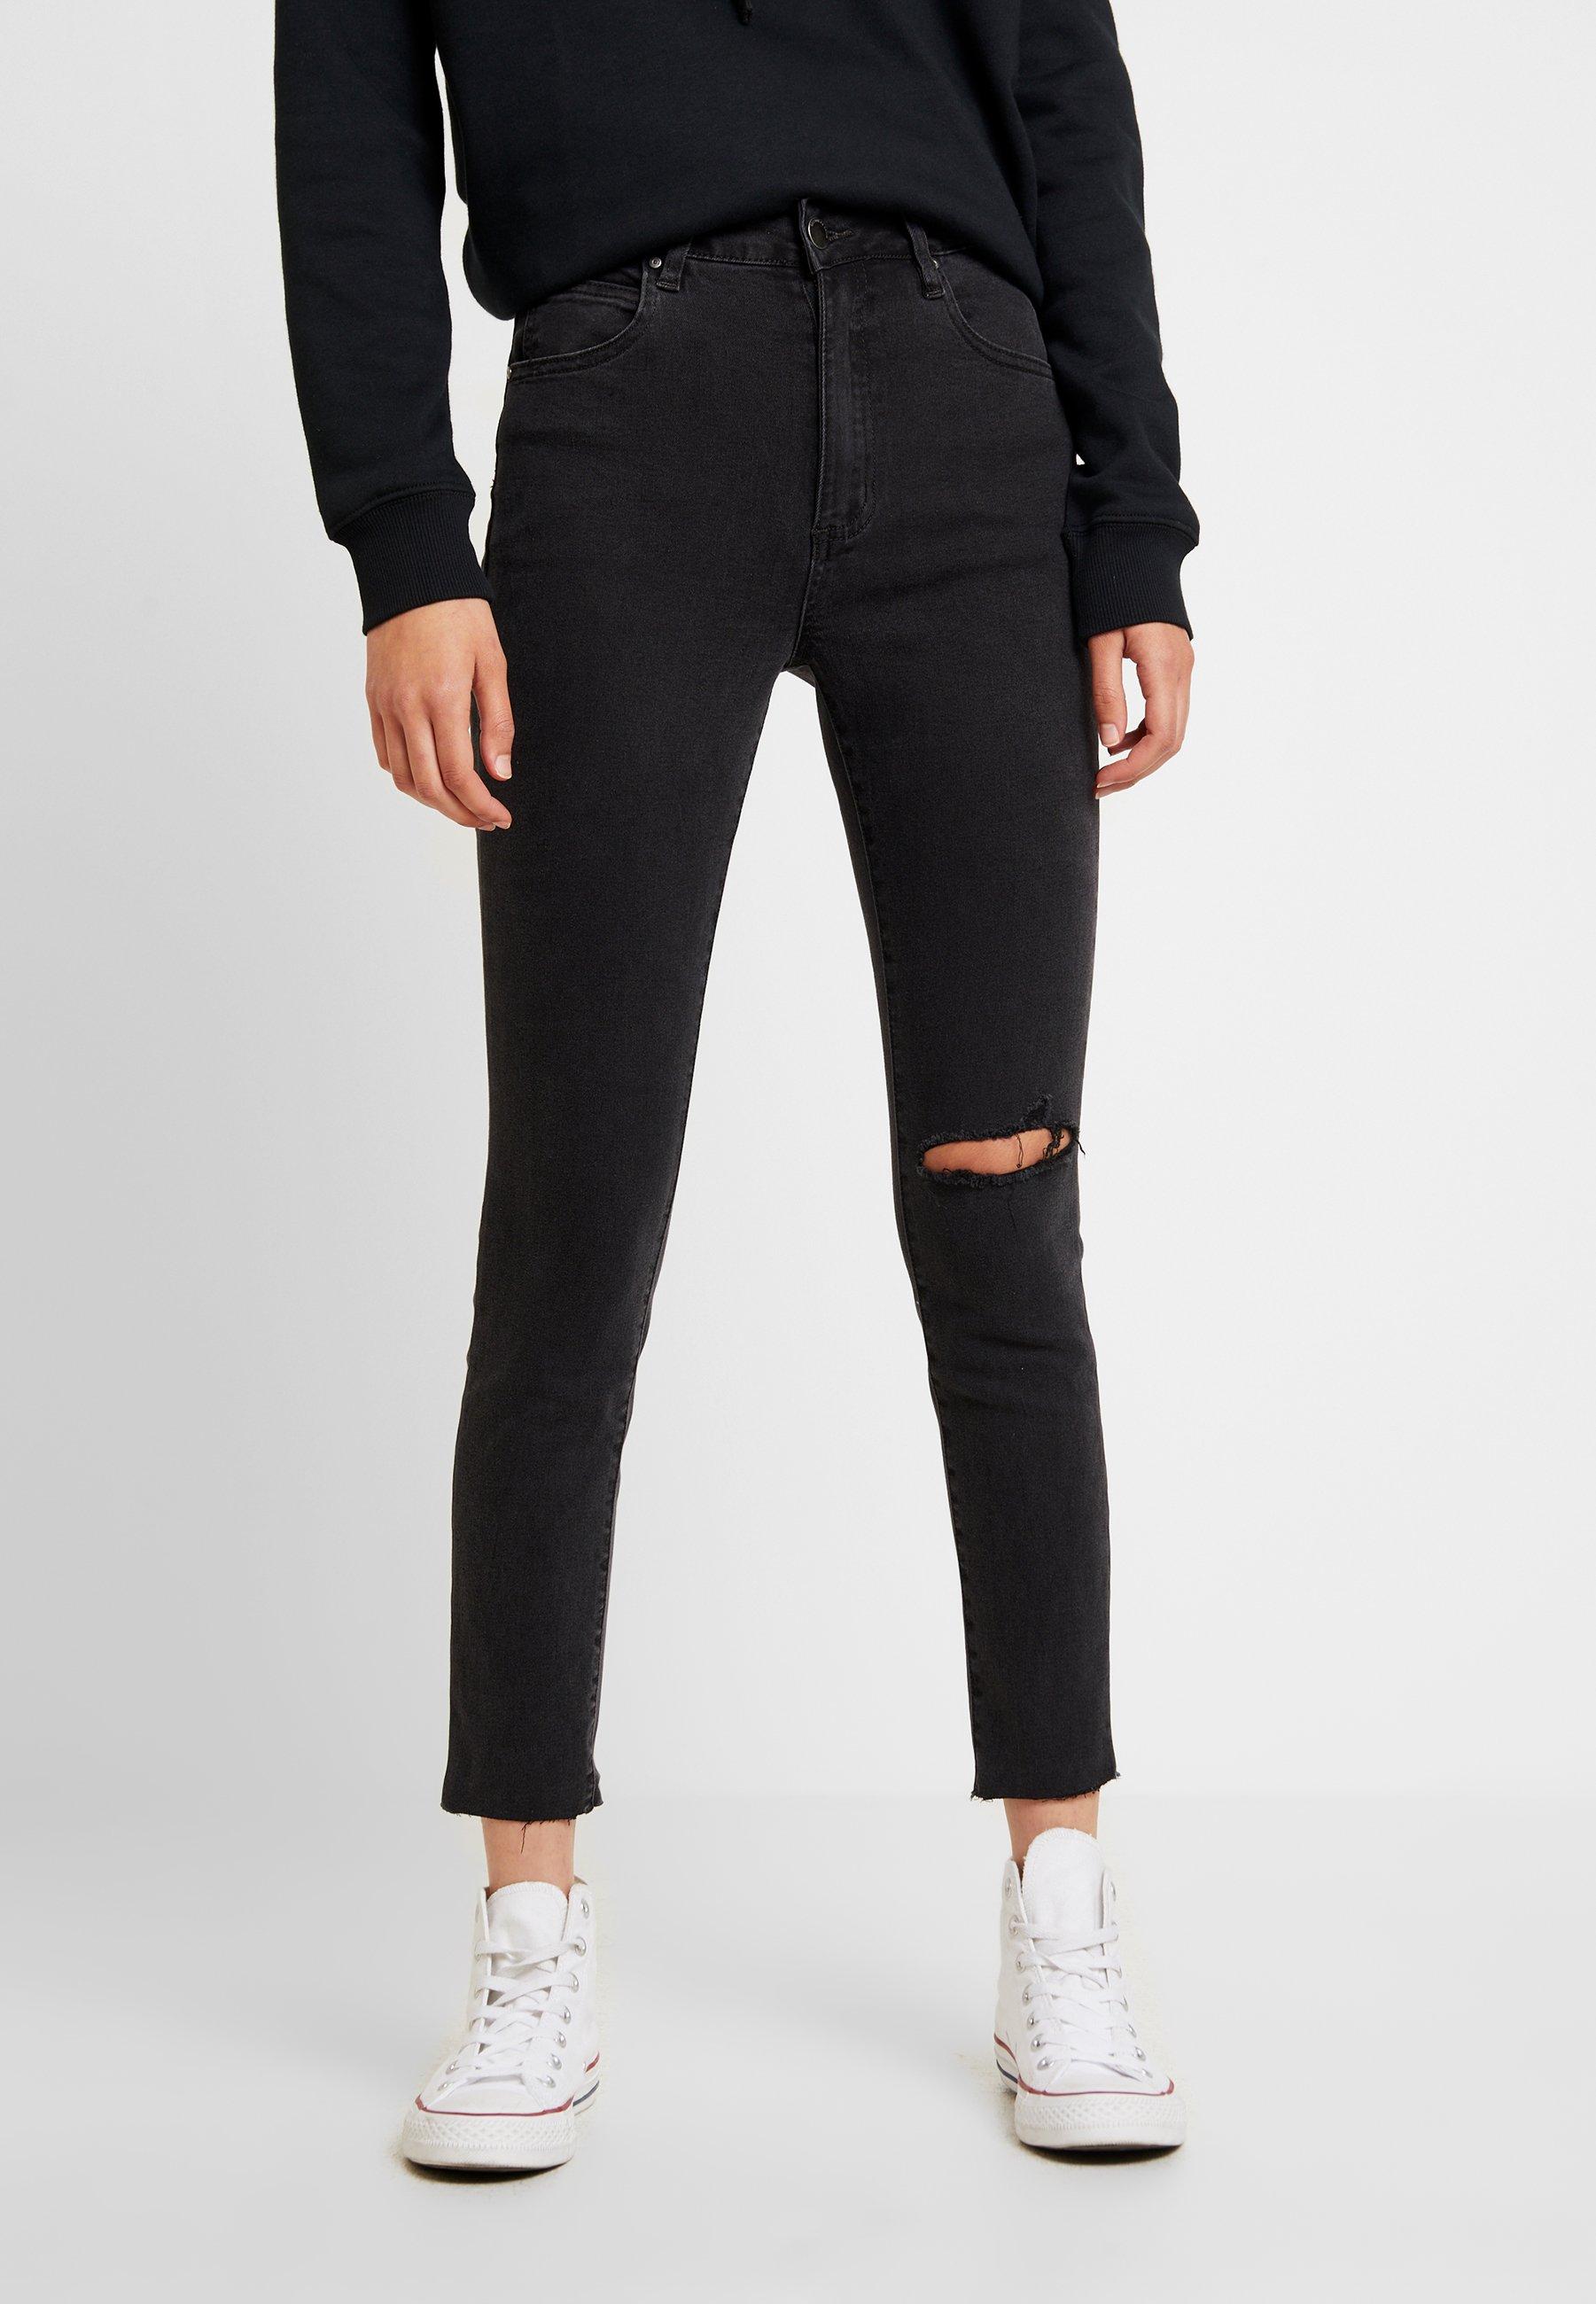 High GrazerJeans Cotton On Black Skinny Rise Washed PZiwTkulXO